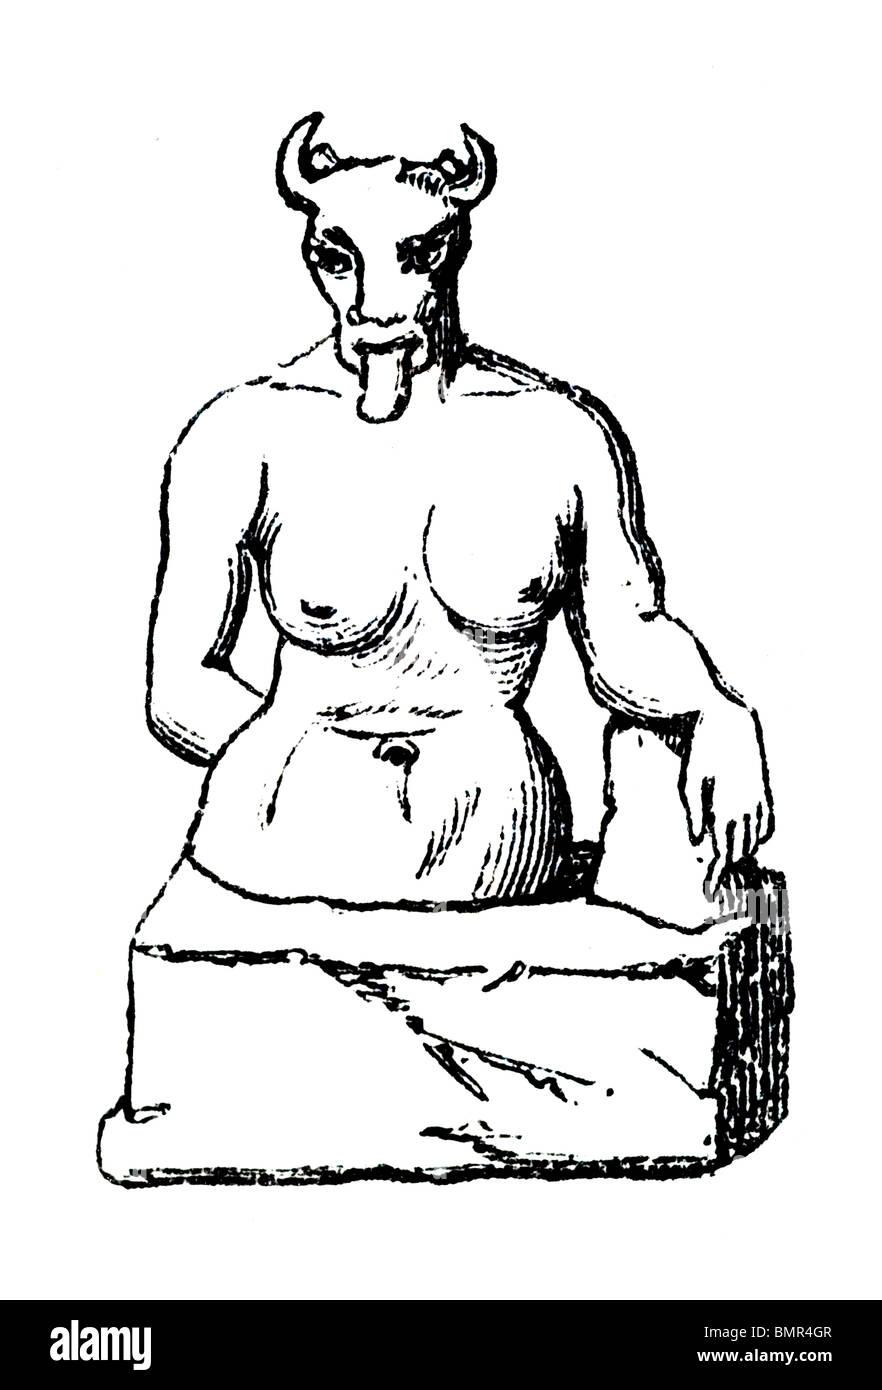 Biozuni - Stock Image